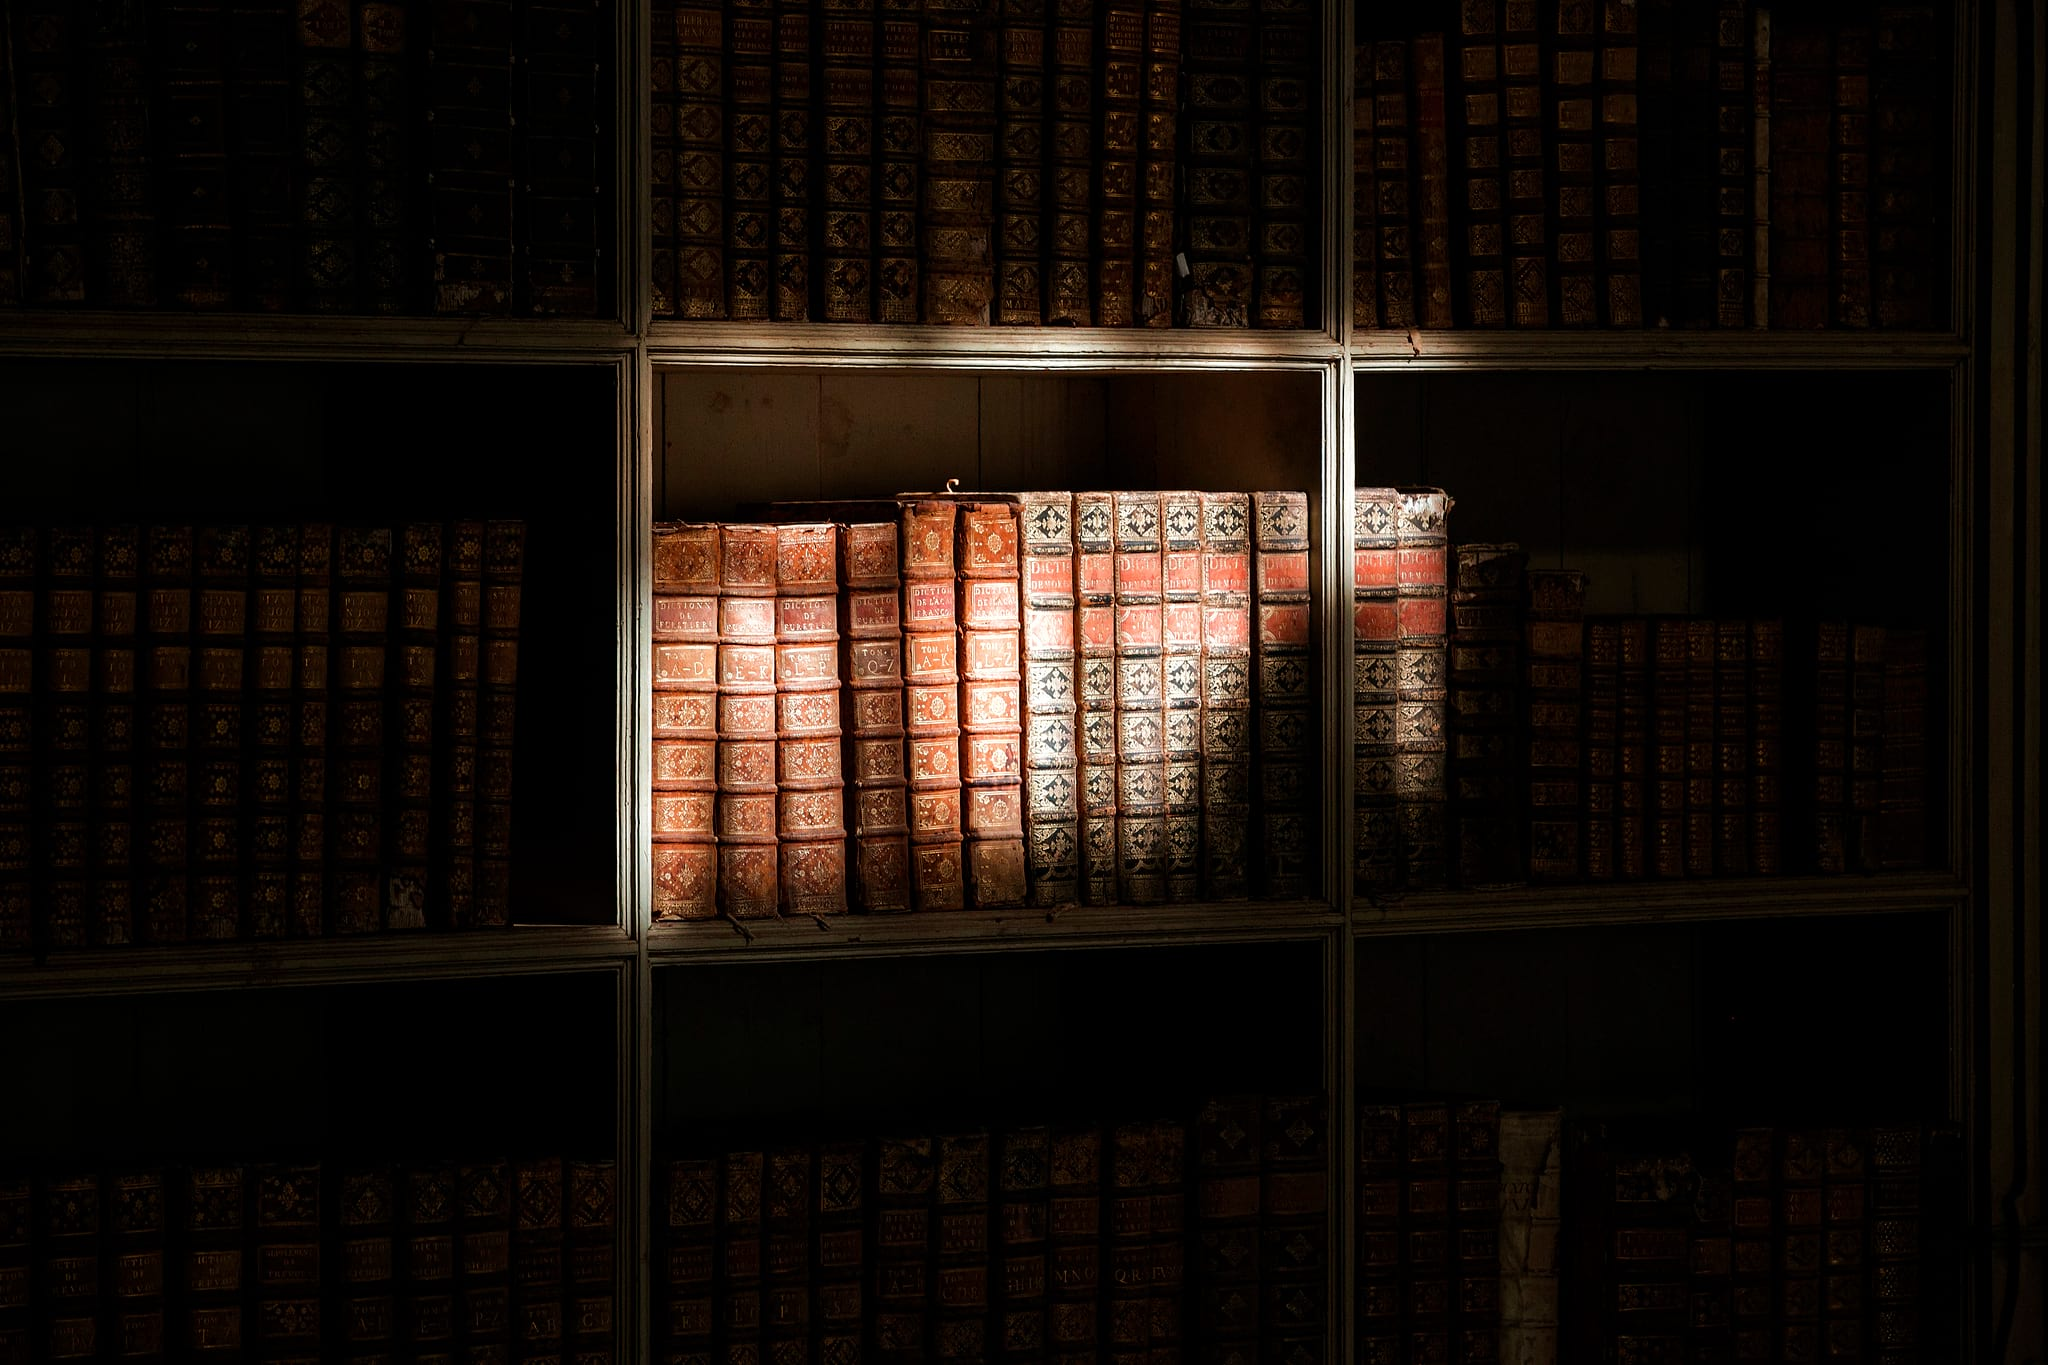 PÚBLICO - O ADN da cultura portuguesa reunido em 30 volumes